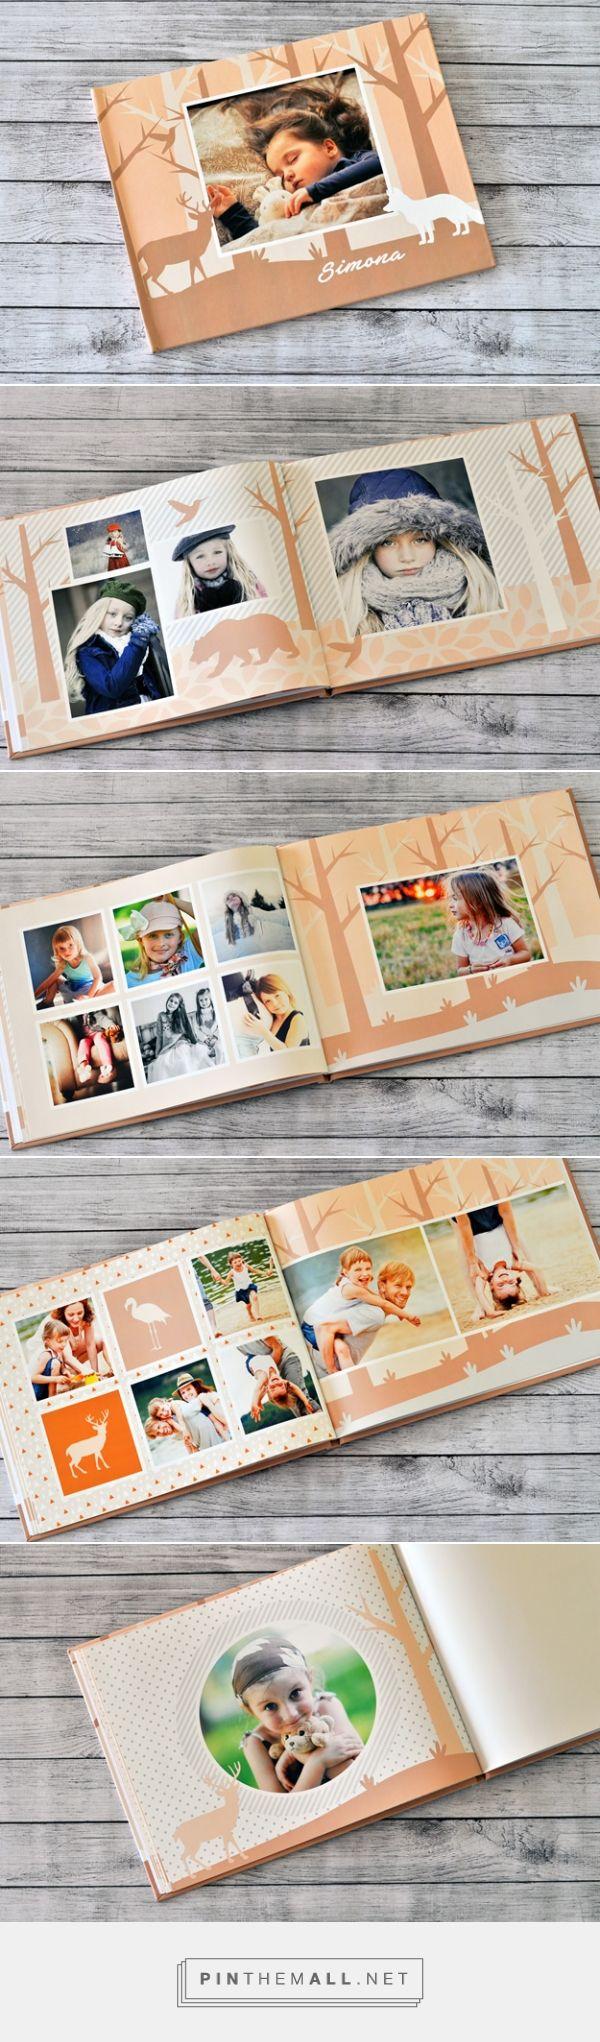 Alon Simona [versión Nena]: Diseño de Fotolibro para descargar Gratis y completar con tus fotos. | Blog - Fábrica de Fotolibros - created via https://pinthemall.net